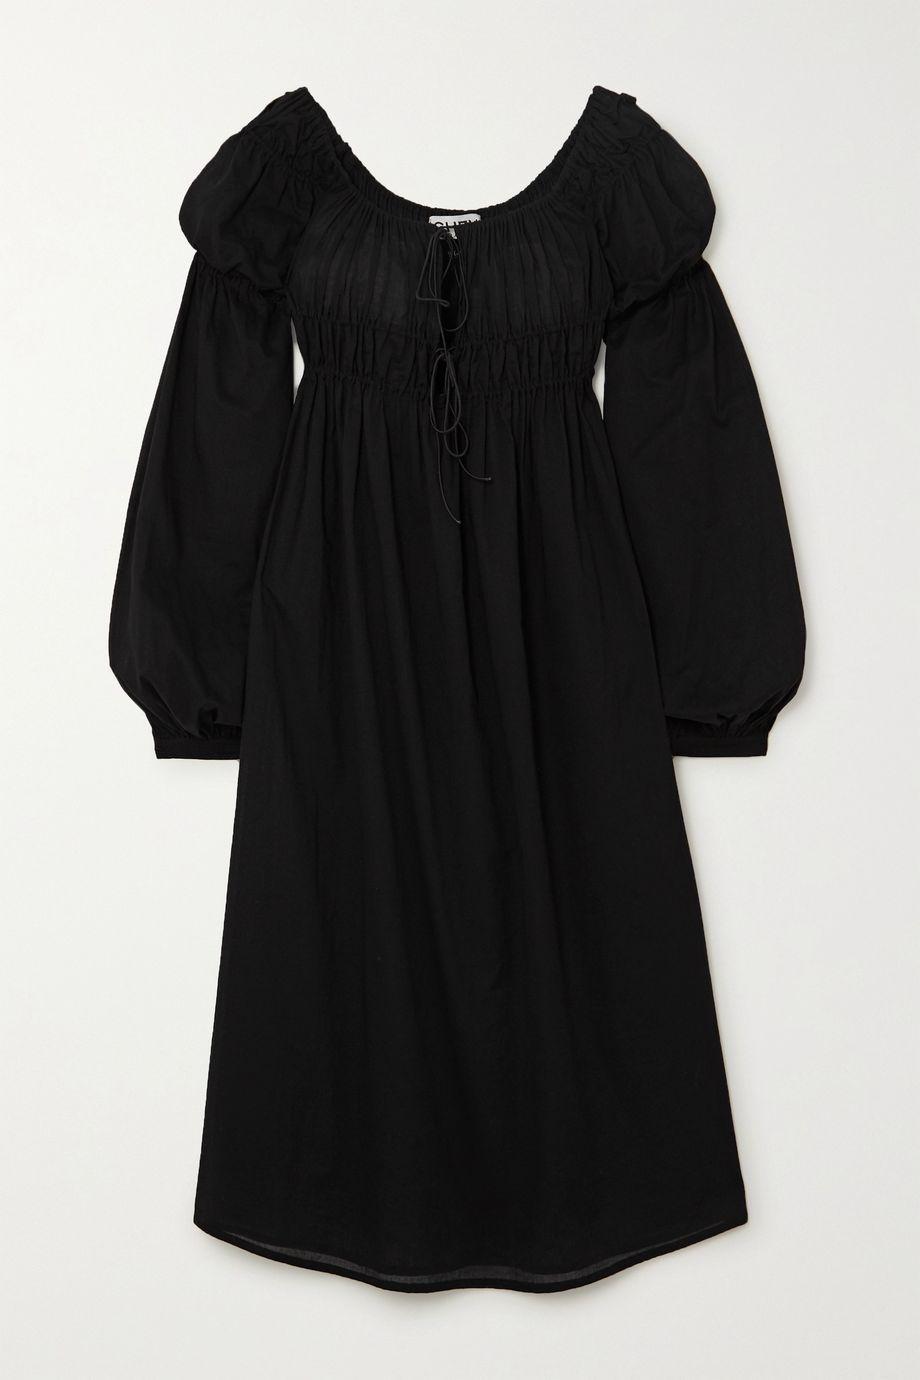 Àcheval Pampa Antonia gathered cotton-voile midi dress